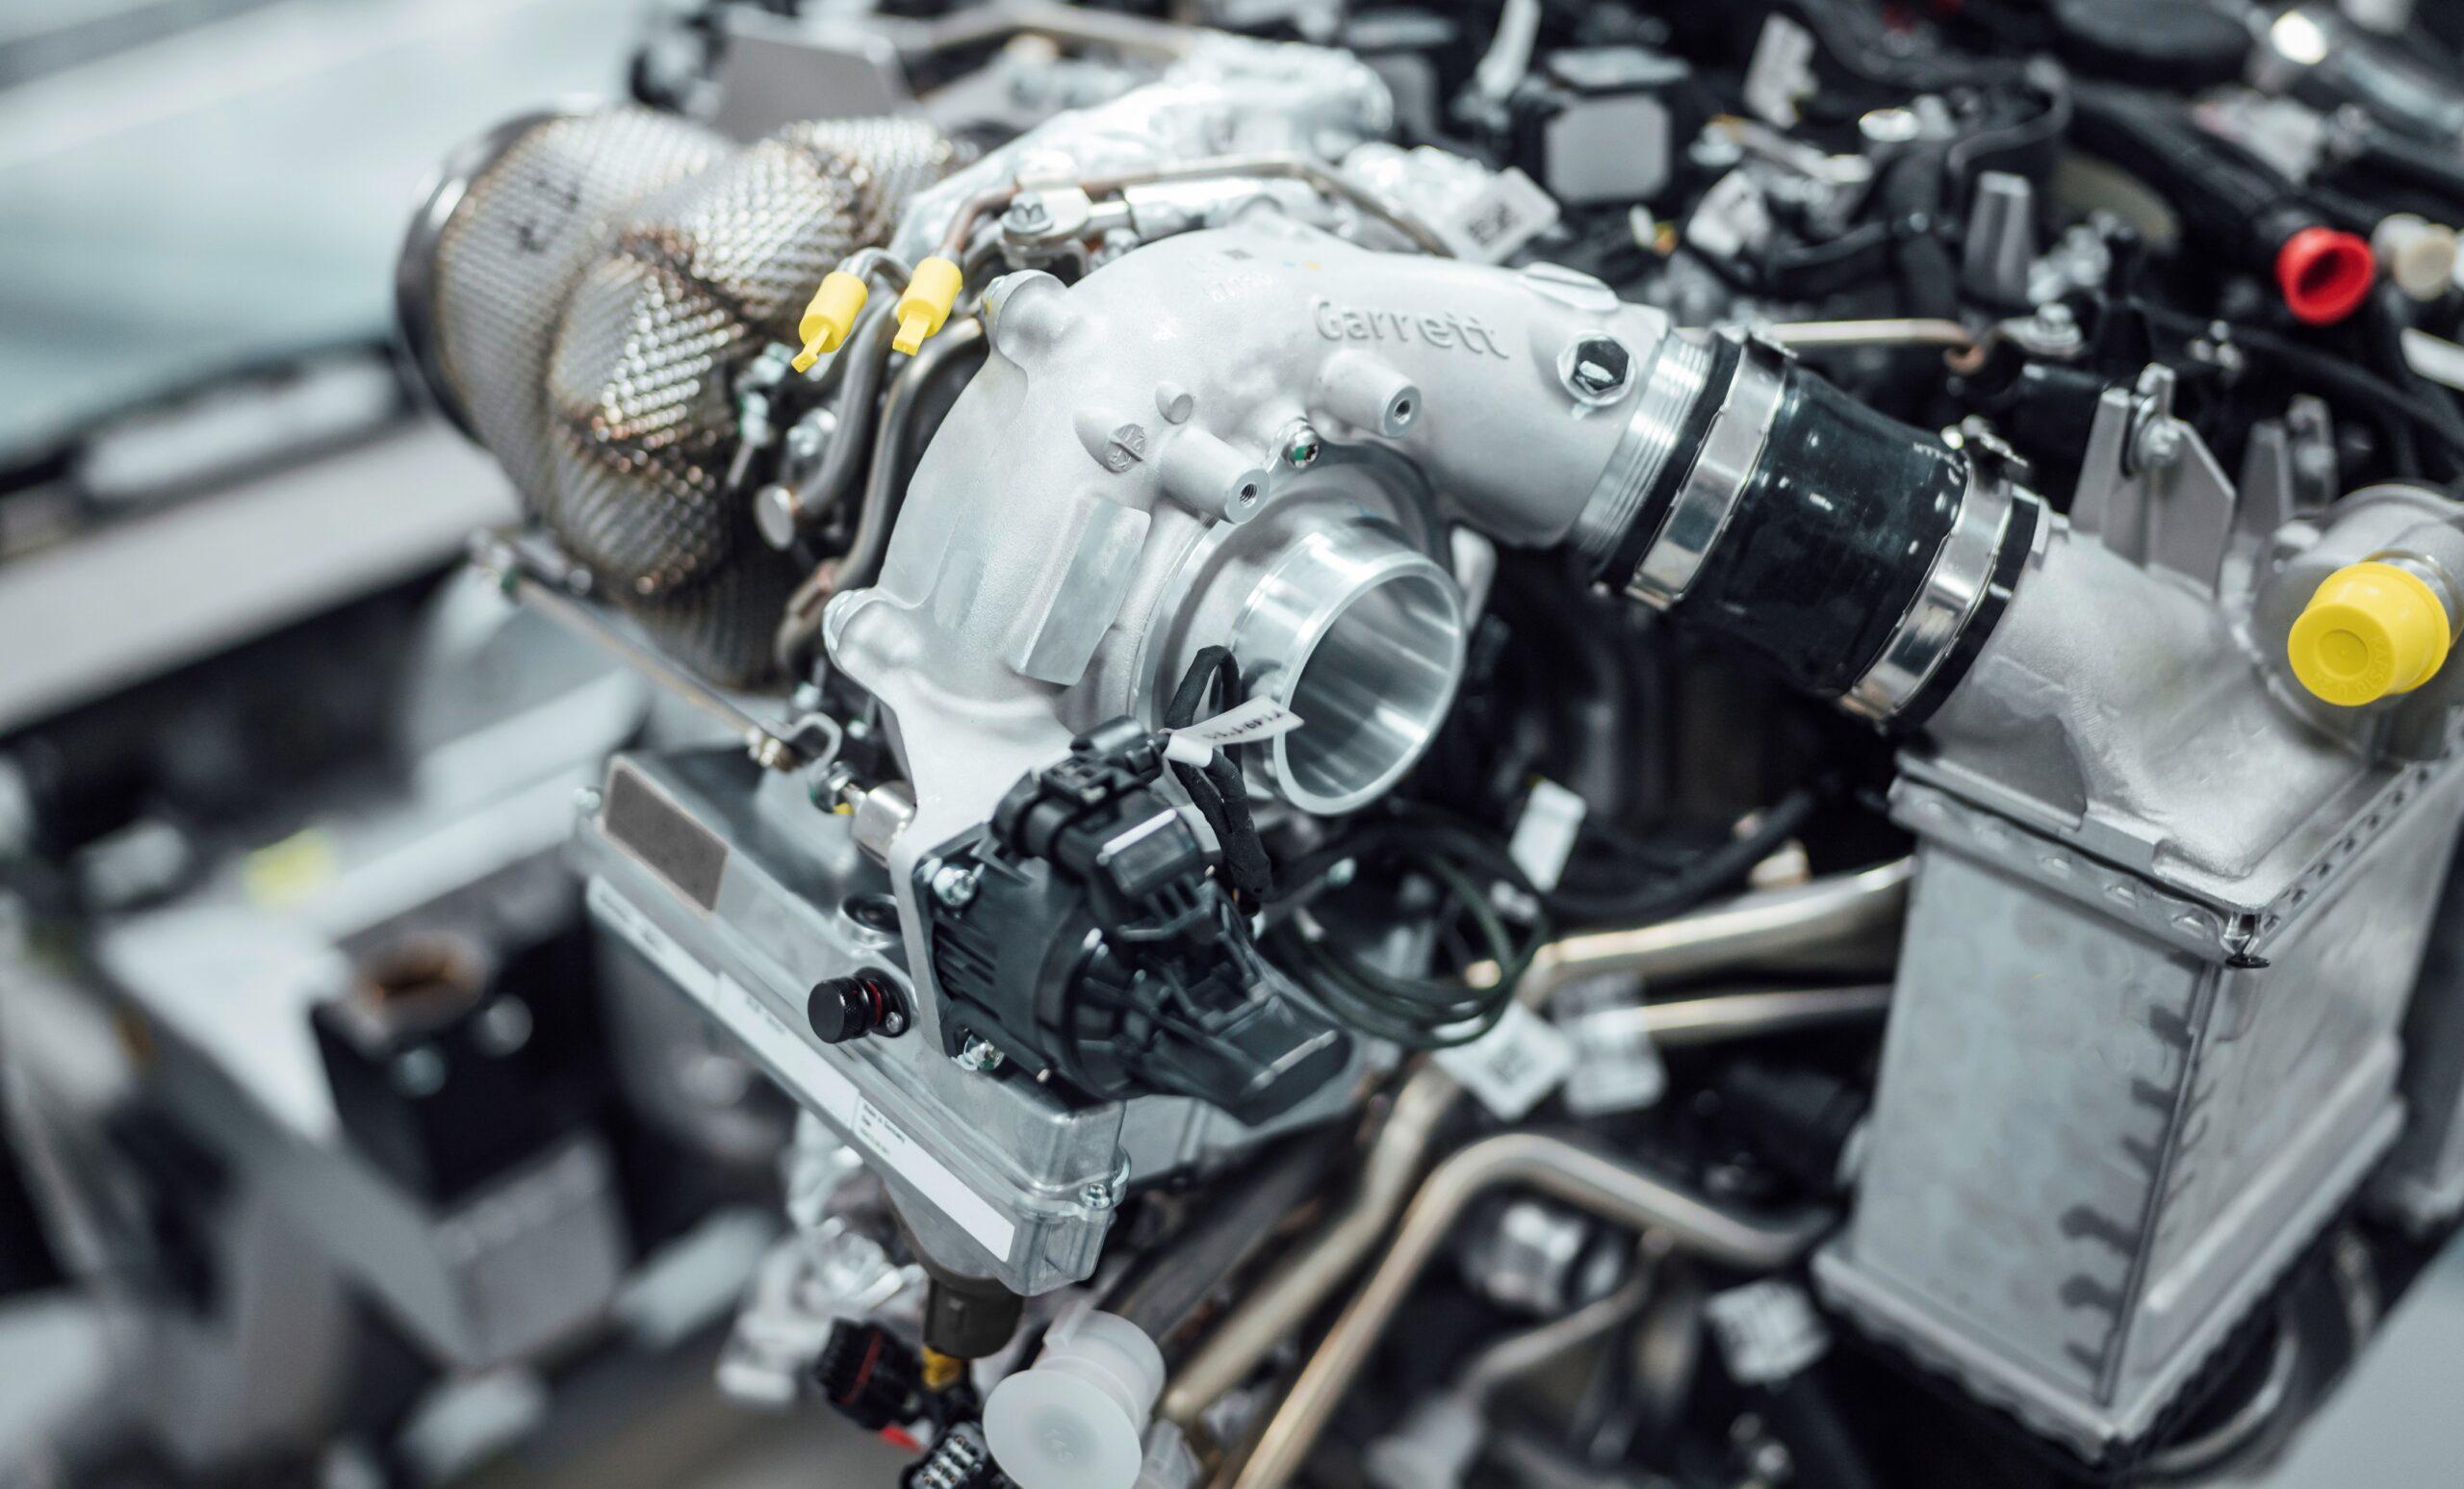 Innovative High Performance Antriebskomponenten made by Mercedes-AMG, elektrifizierter Turbolader // Innovative High Performance drive components made by Mercedes-AMG, electrified turbo charger